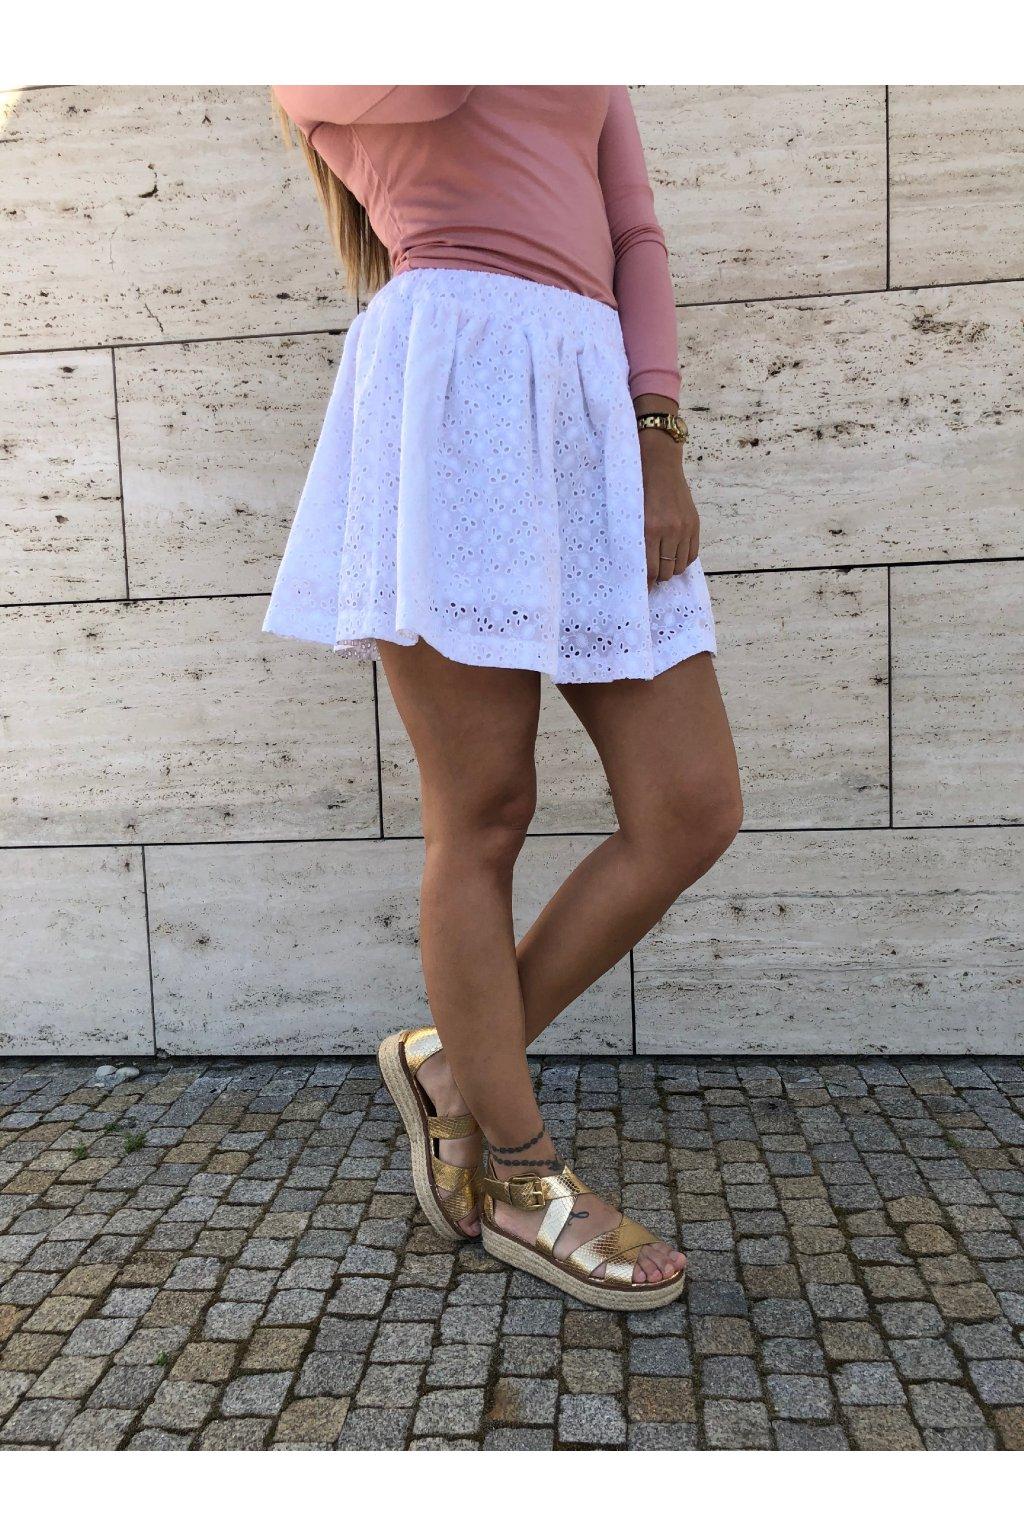 damska sukne bella white eshopat cz 1